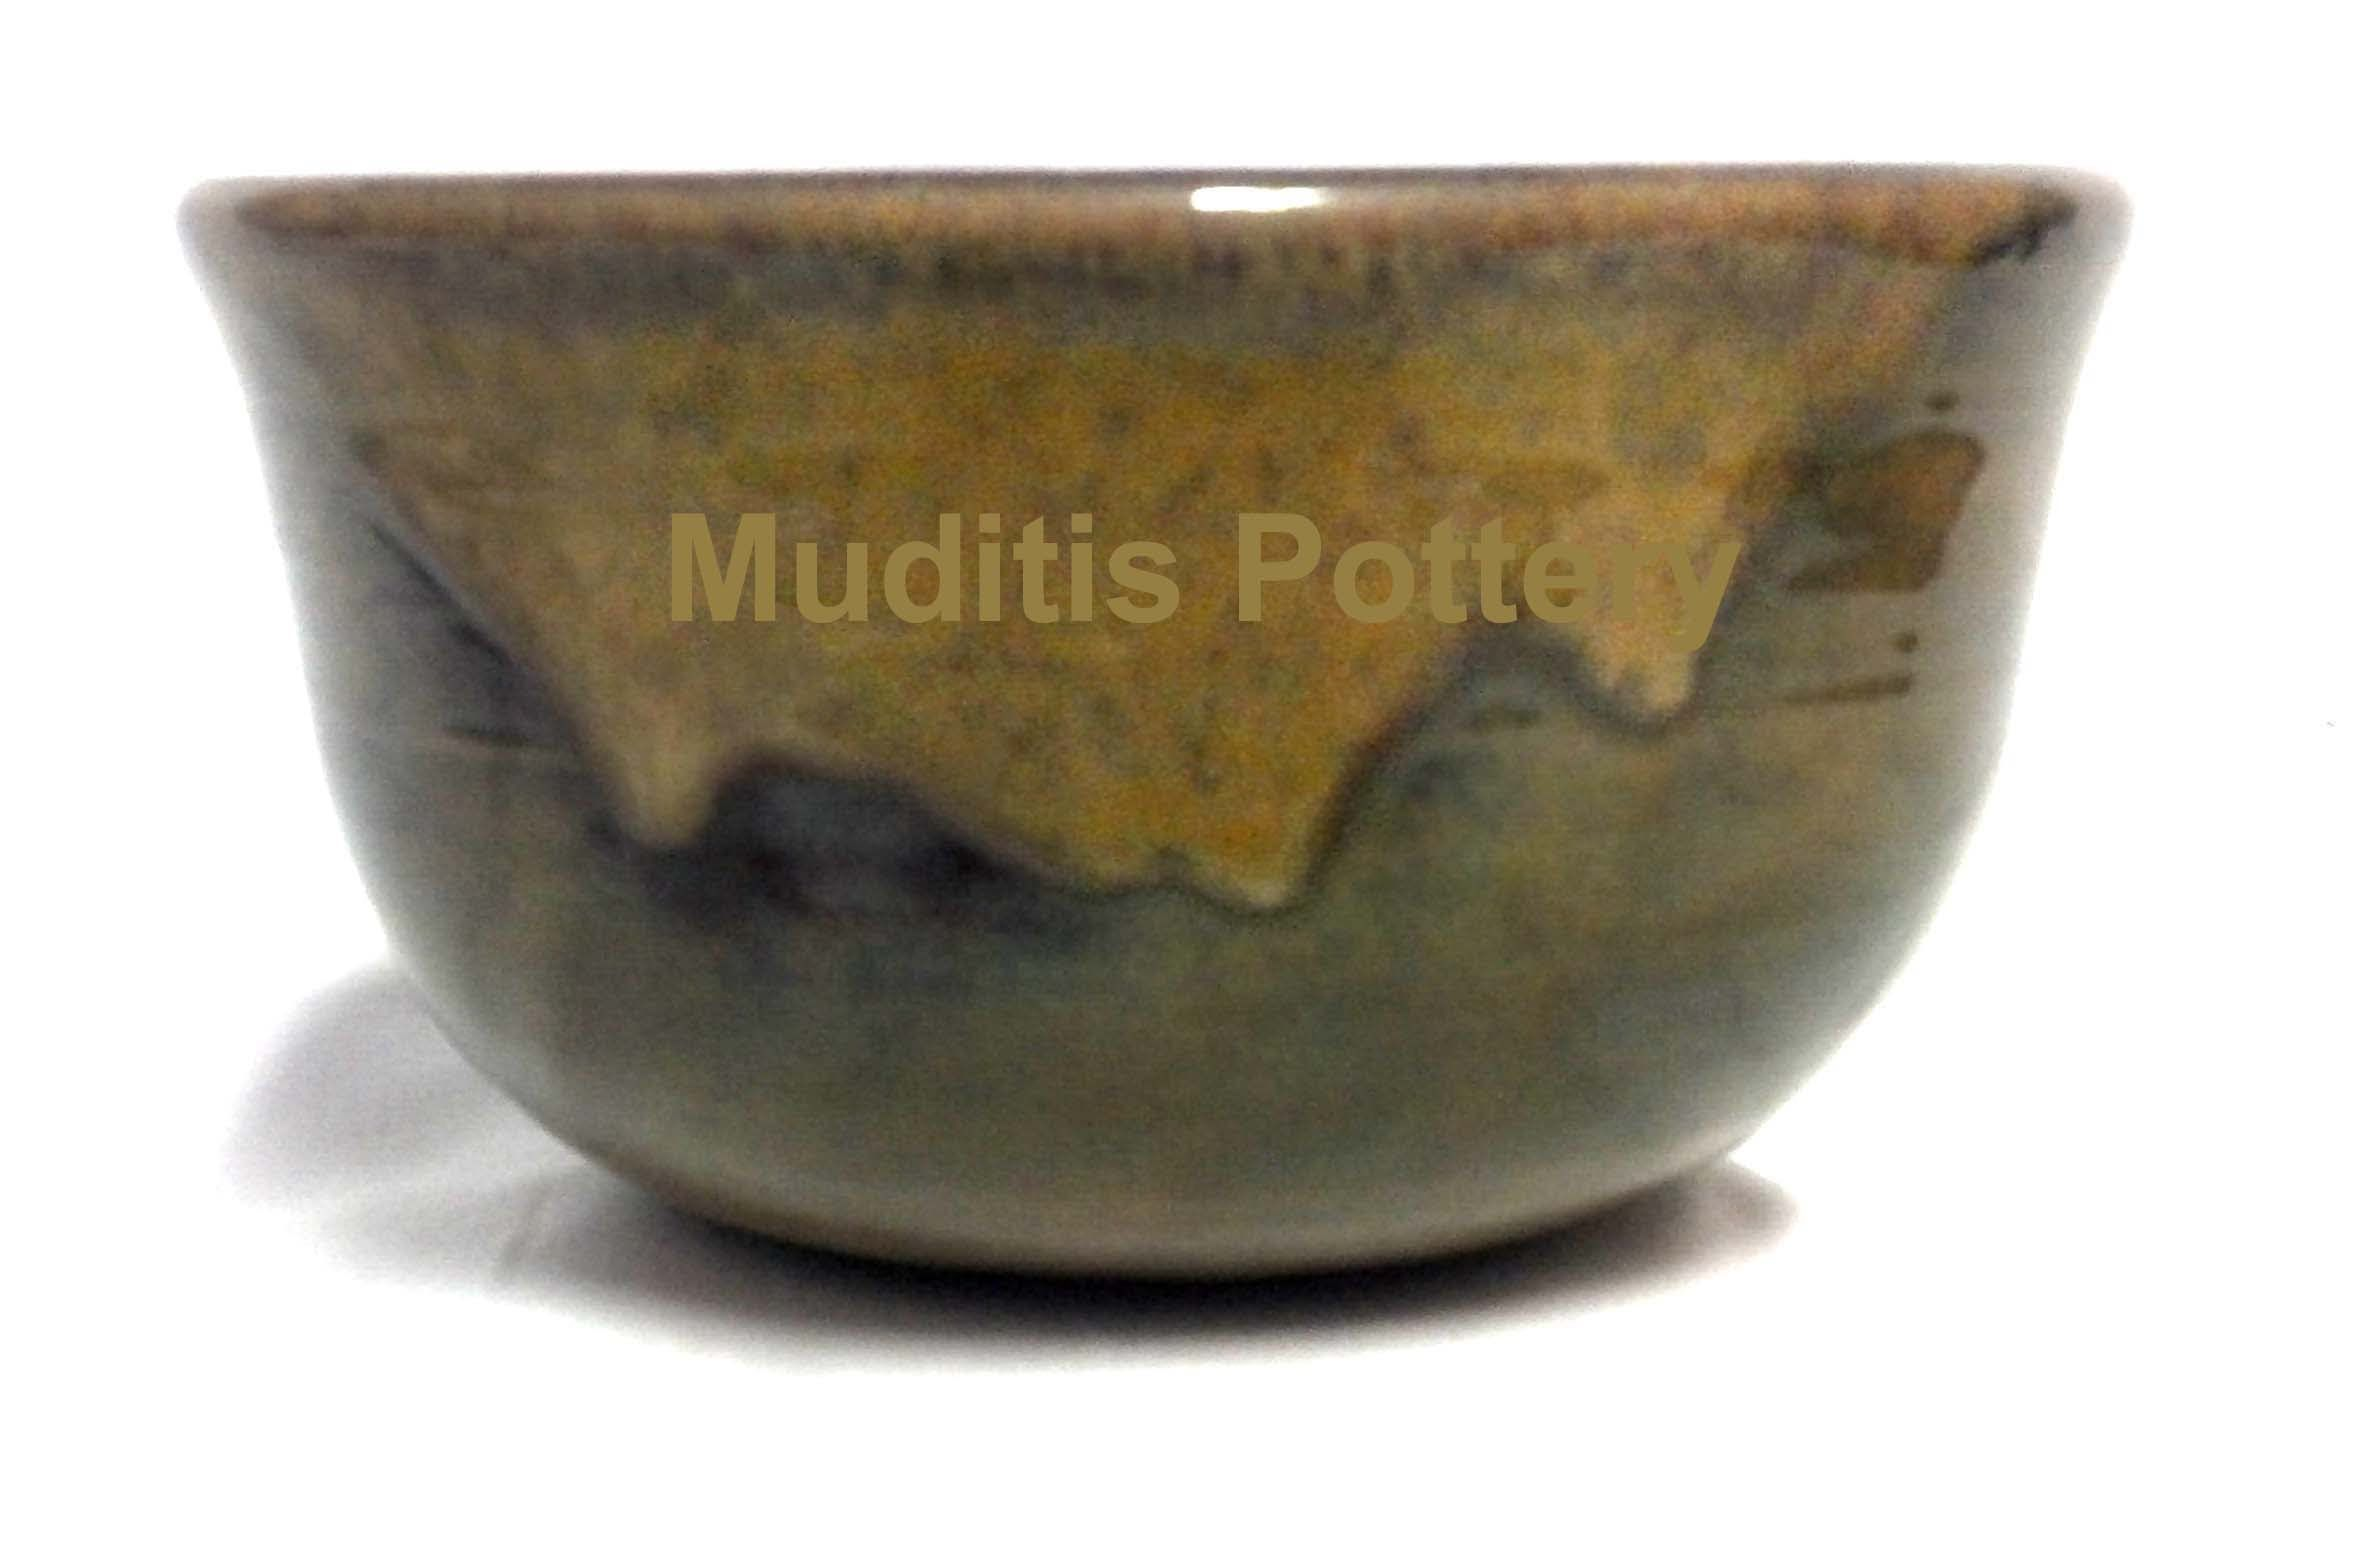 Muditis Pottery Glaze Firing Kiln Opening Part 3 Video 39 Pottery Glazes Pottery Dipped Pots